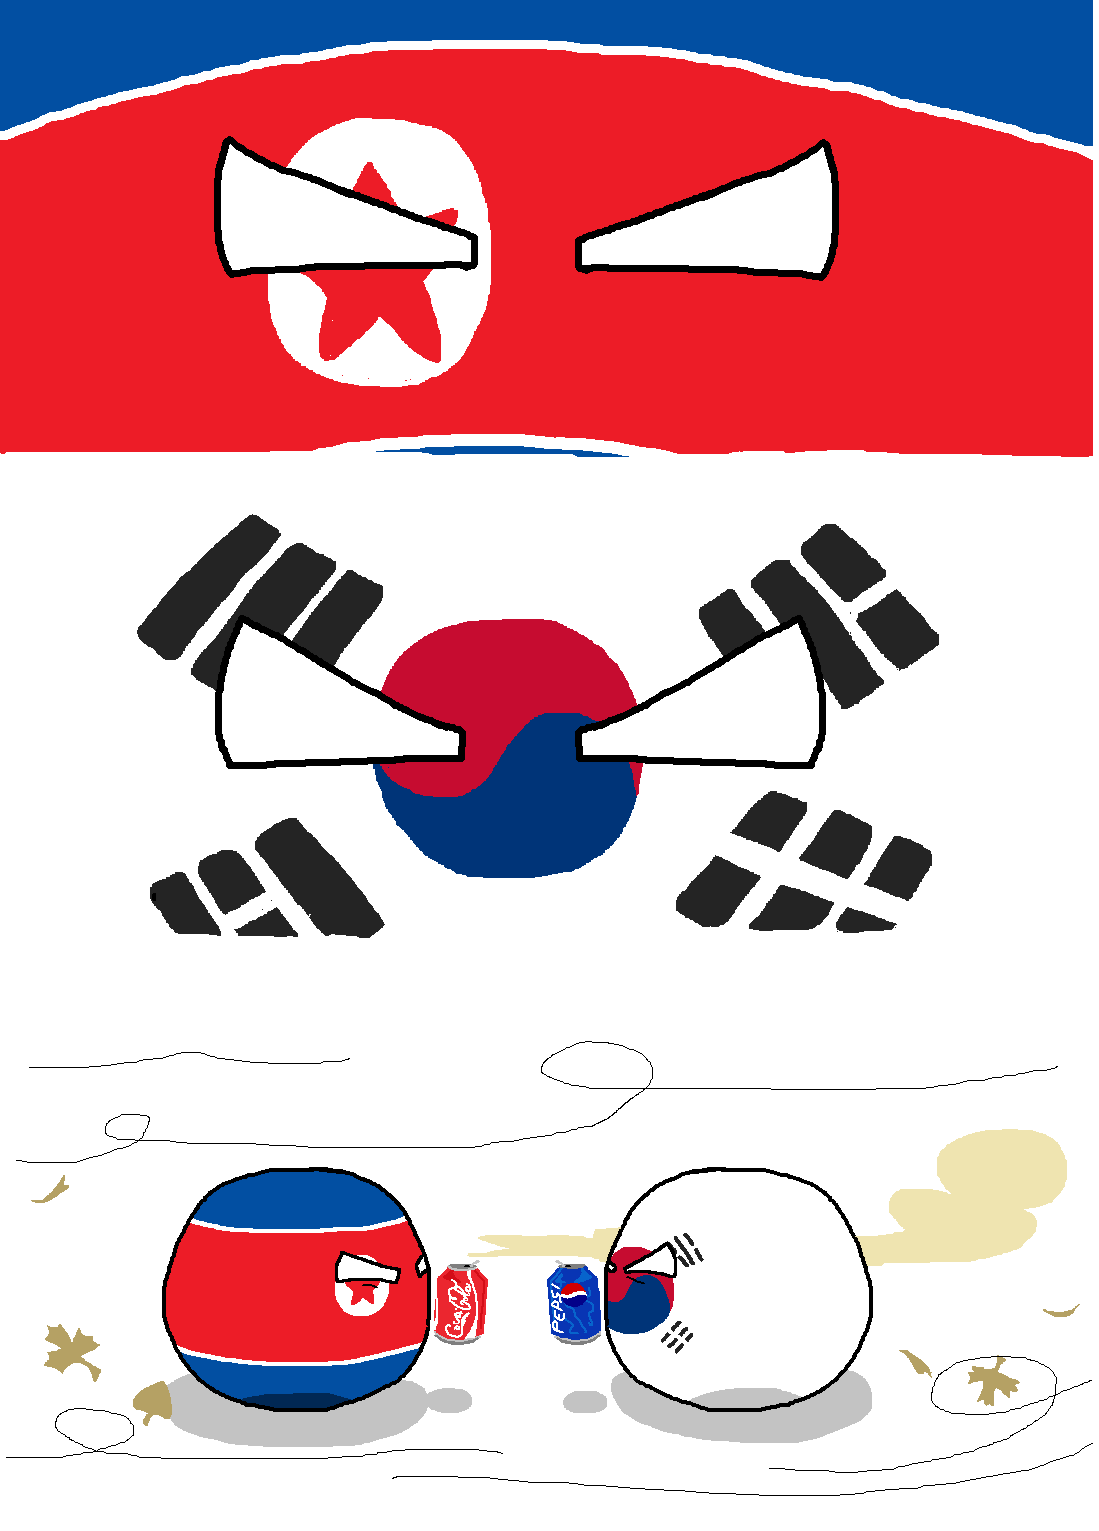 North Koreaball an South Korea sodas.png